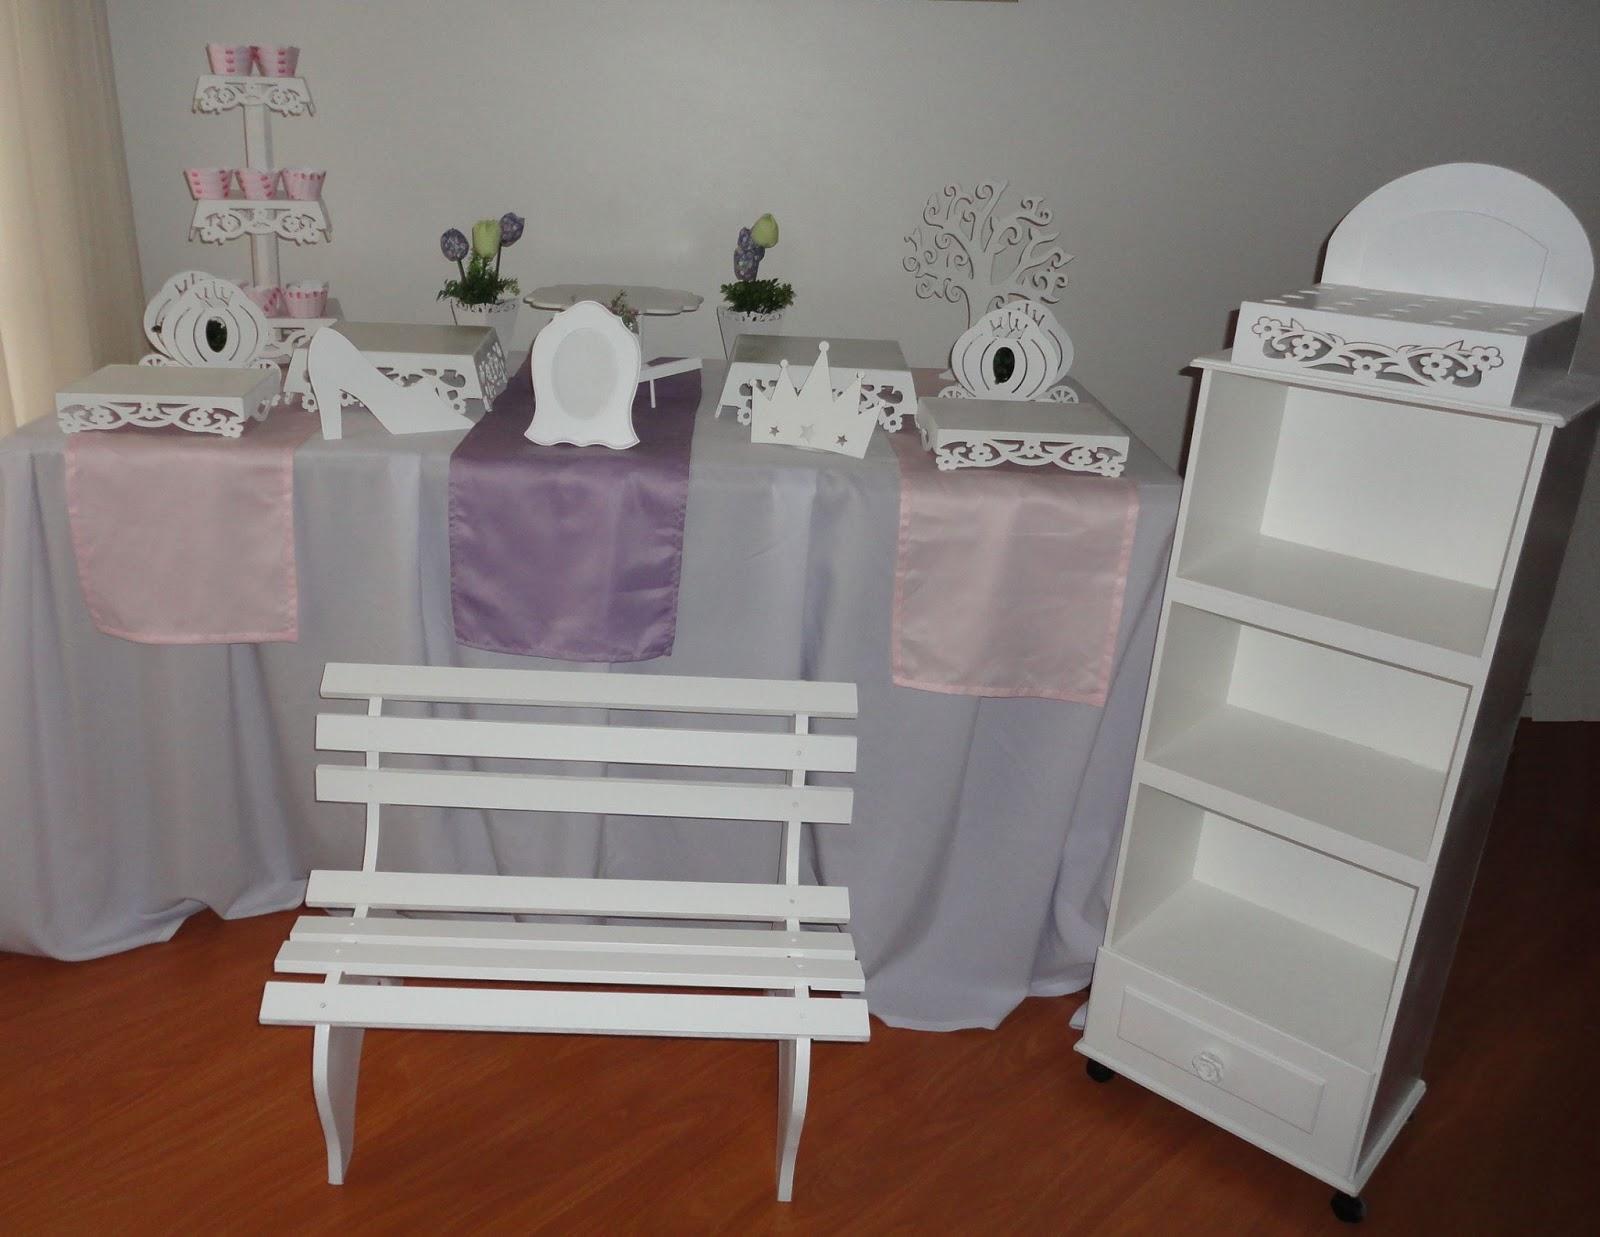 banco de jardim infantil : banco de jardim infantil: Completo – Inclui Porta-lembrancinha, banco de jardim Infantil